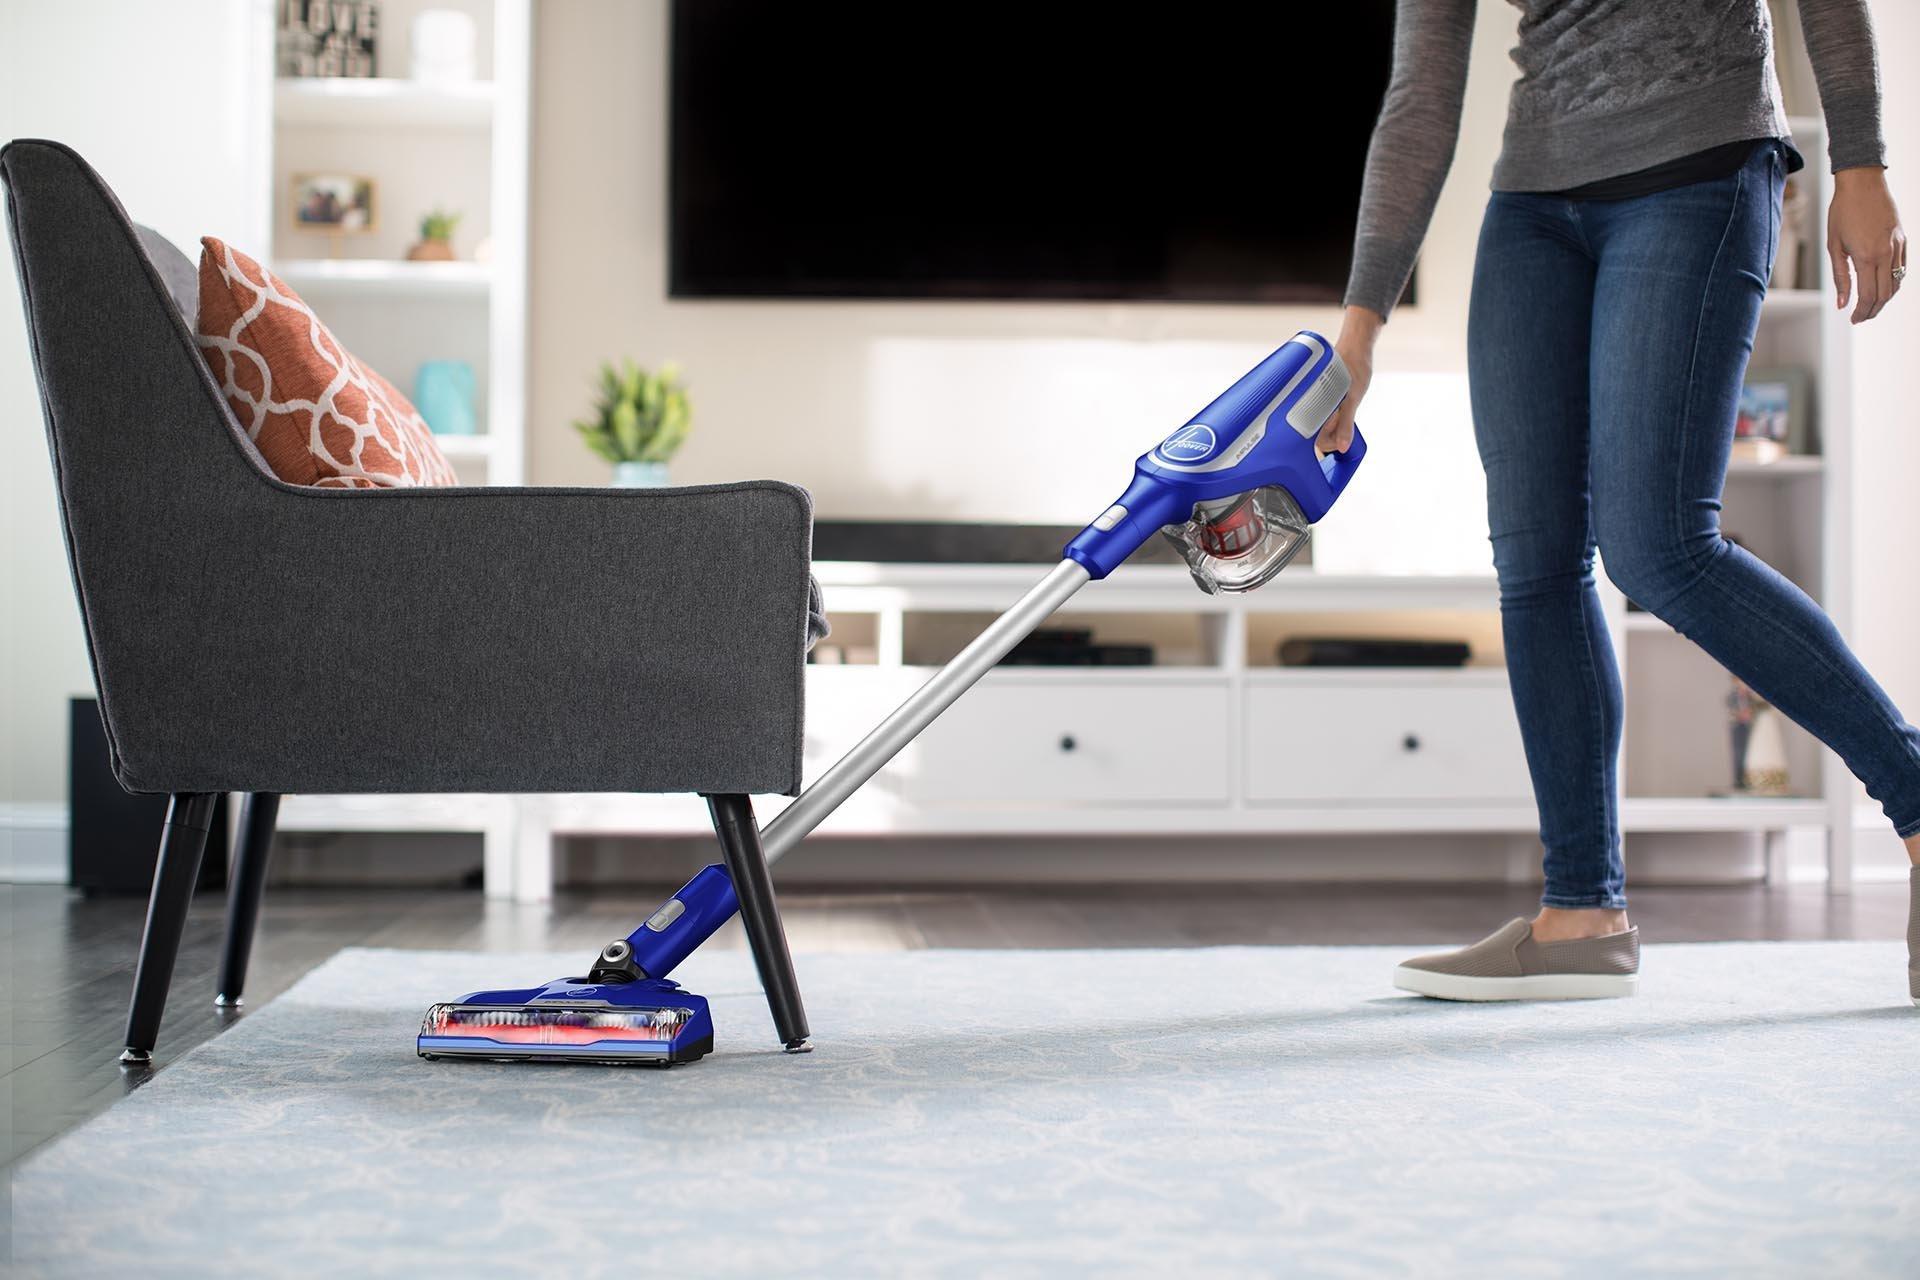 Hoover IMPULSE Cordless Vacuum5